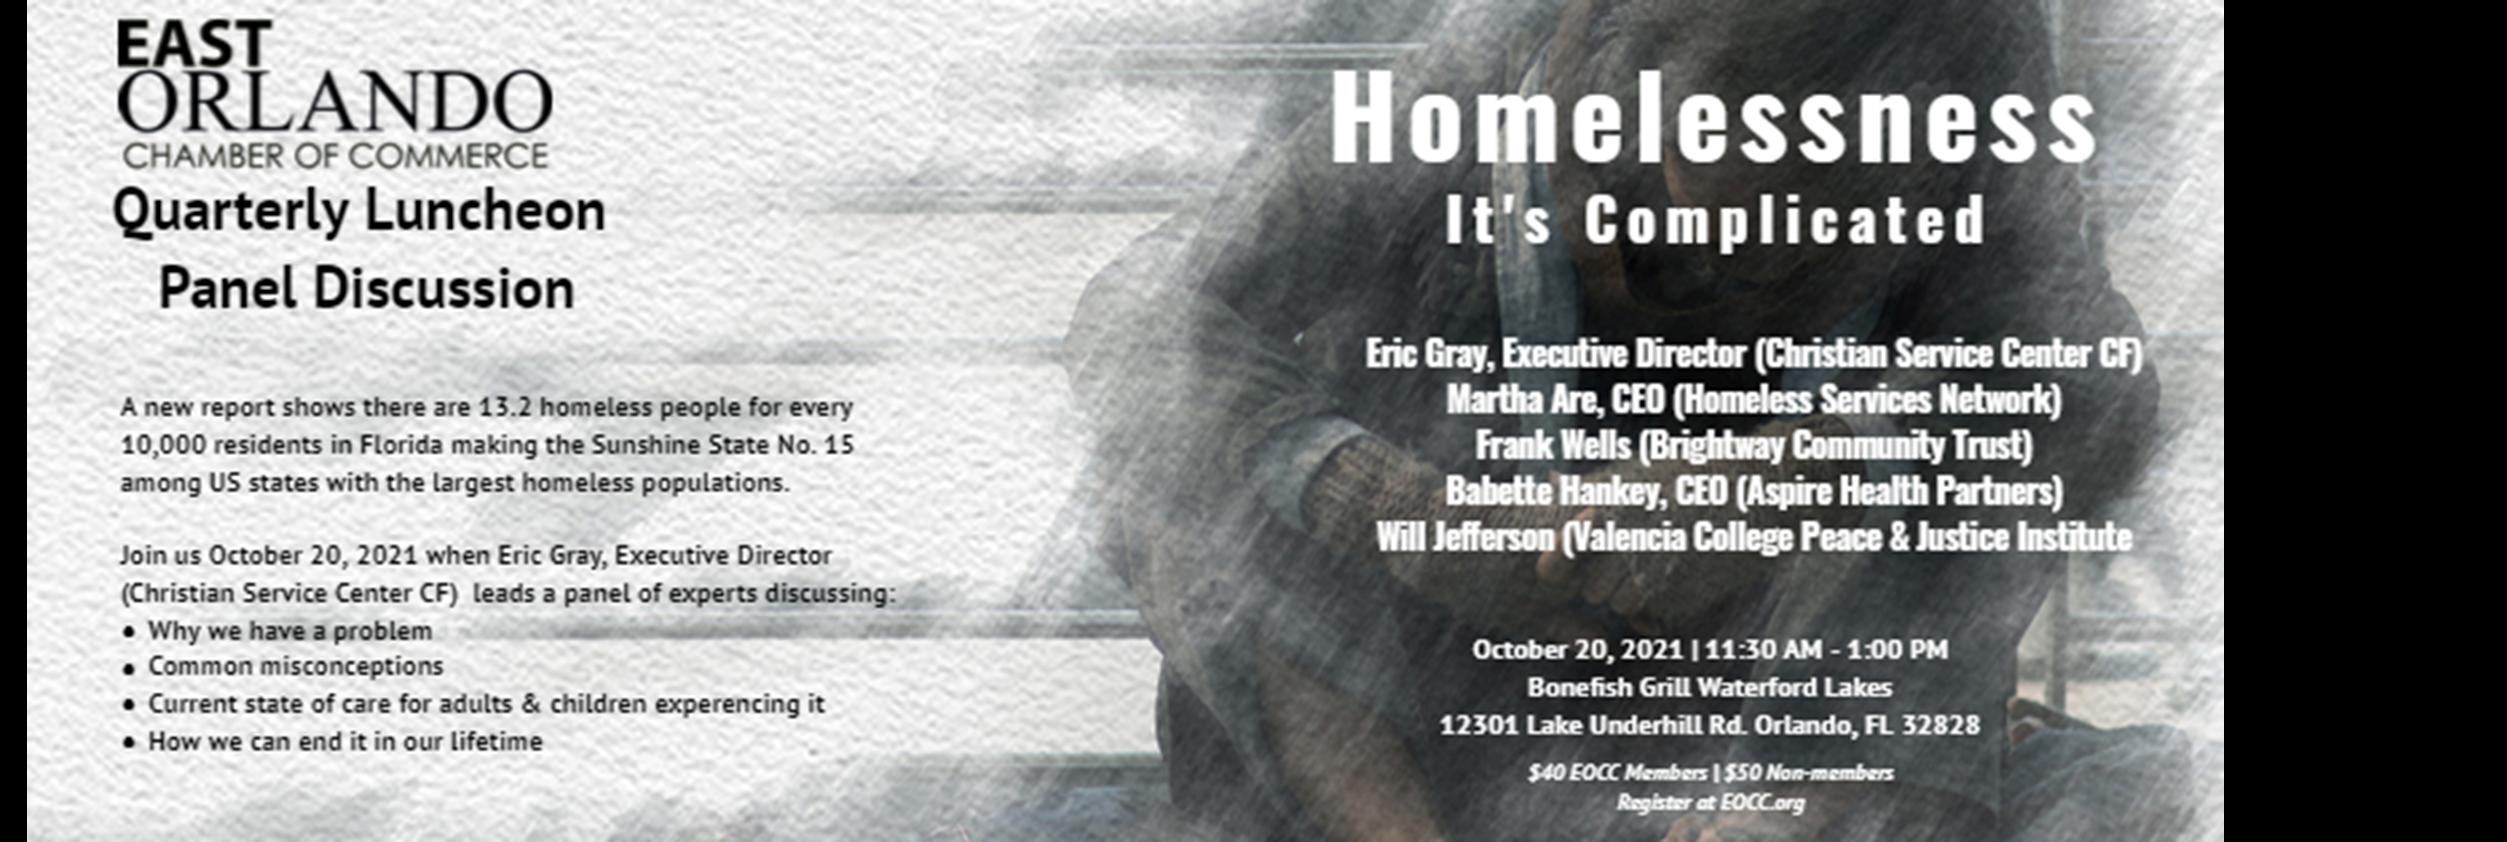 October Chamber Luncheon Homelessness